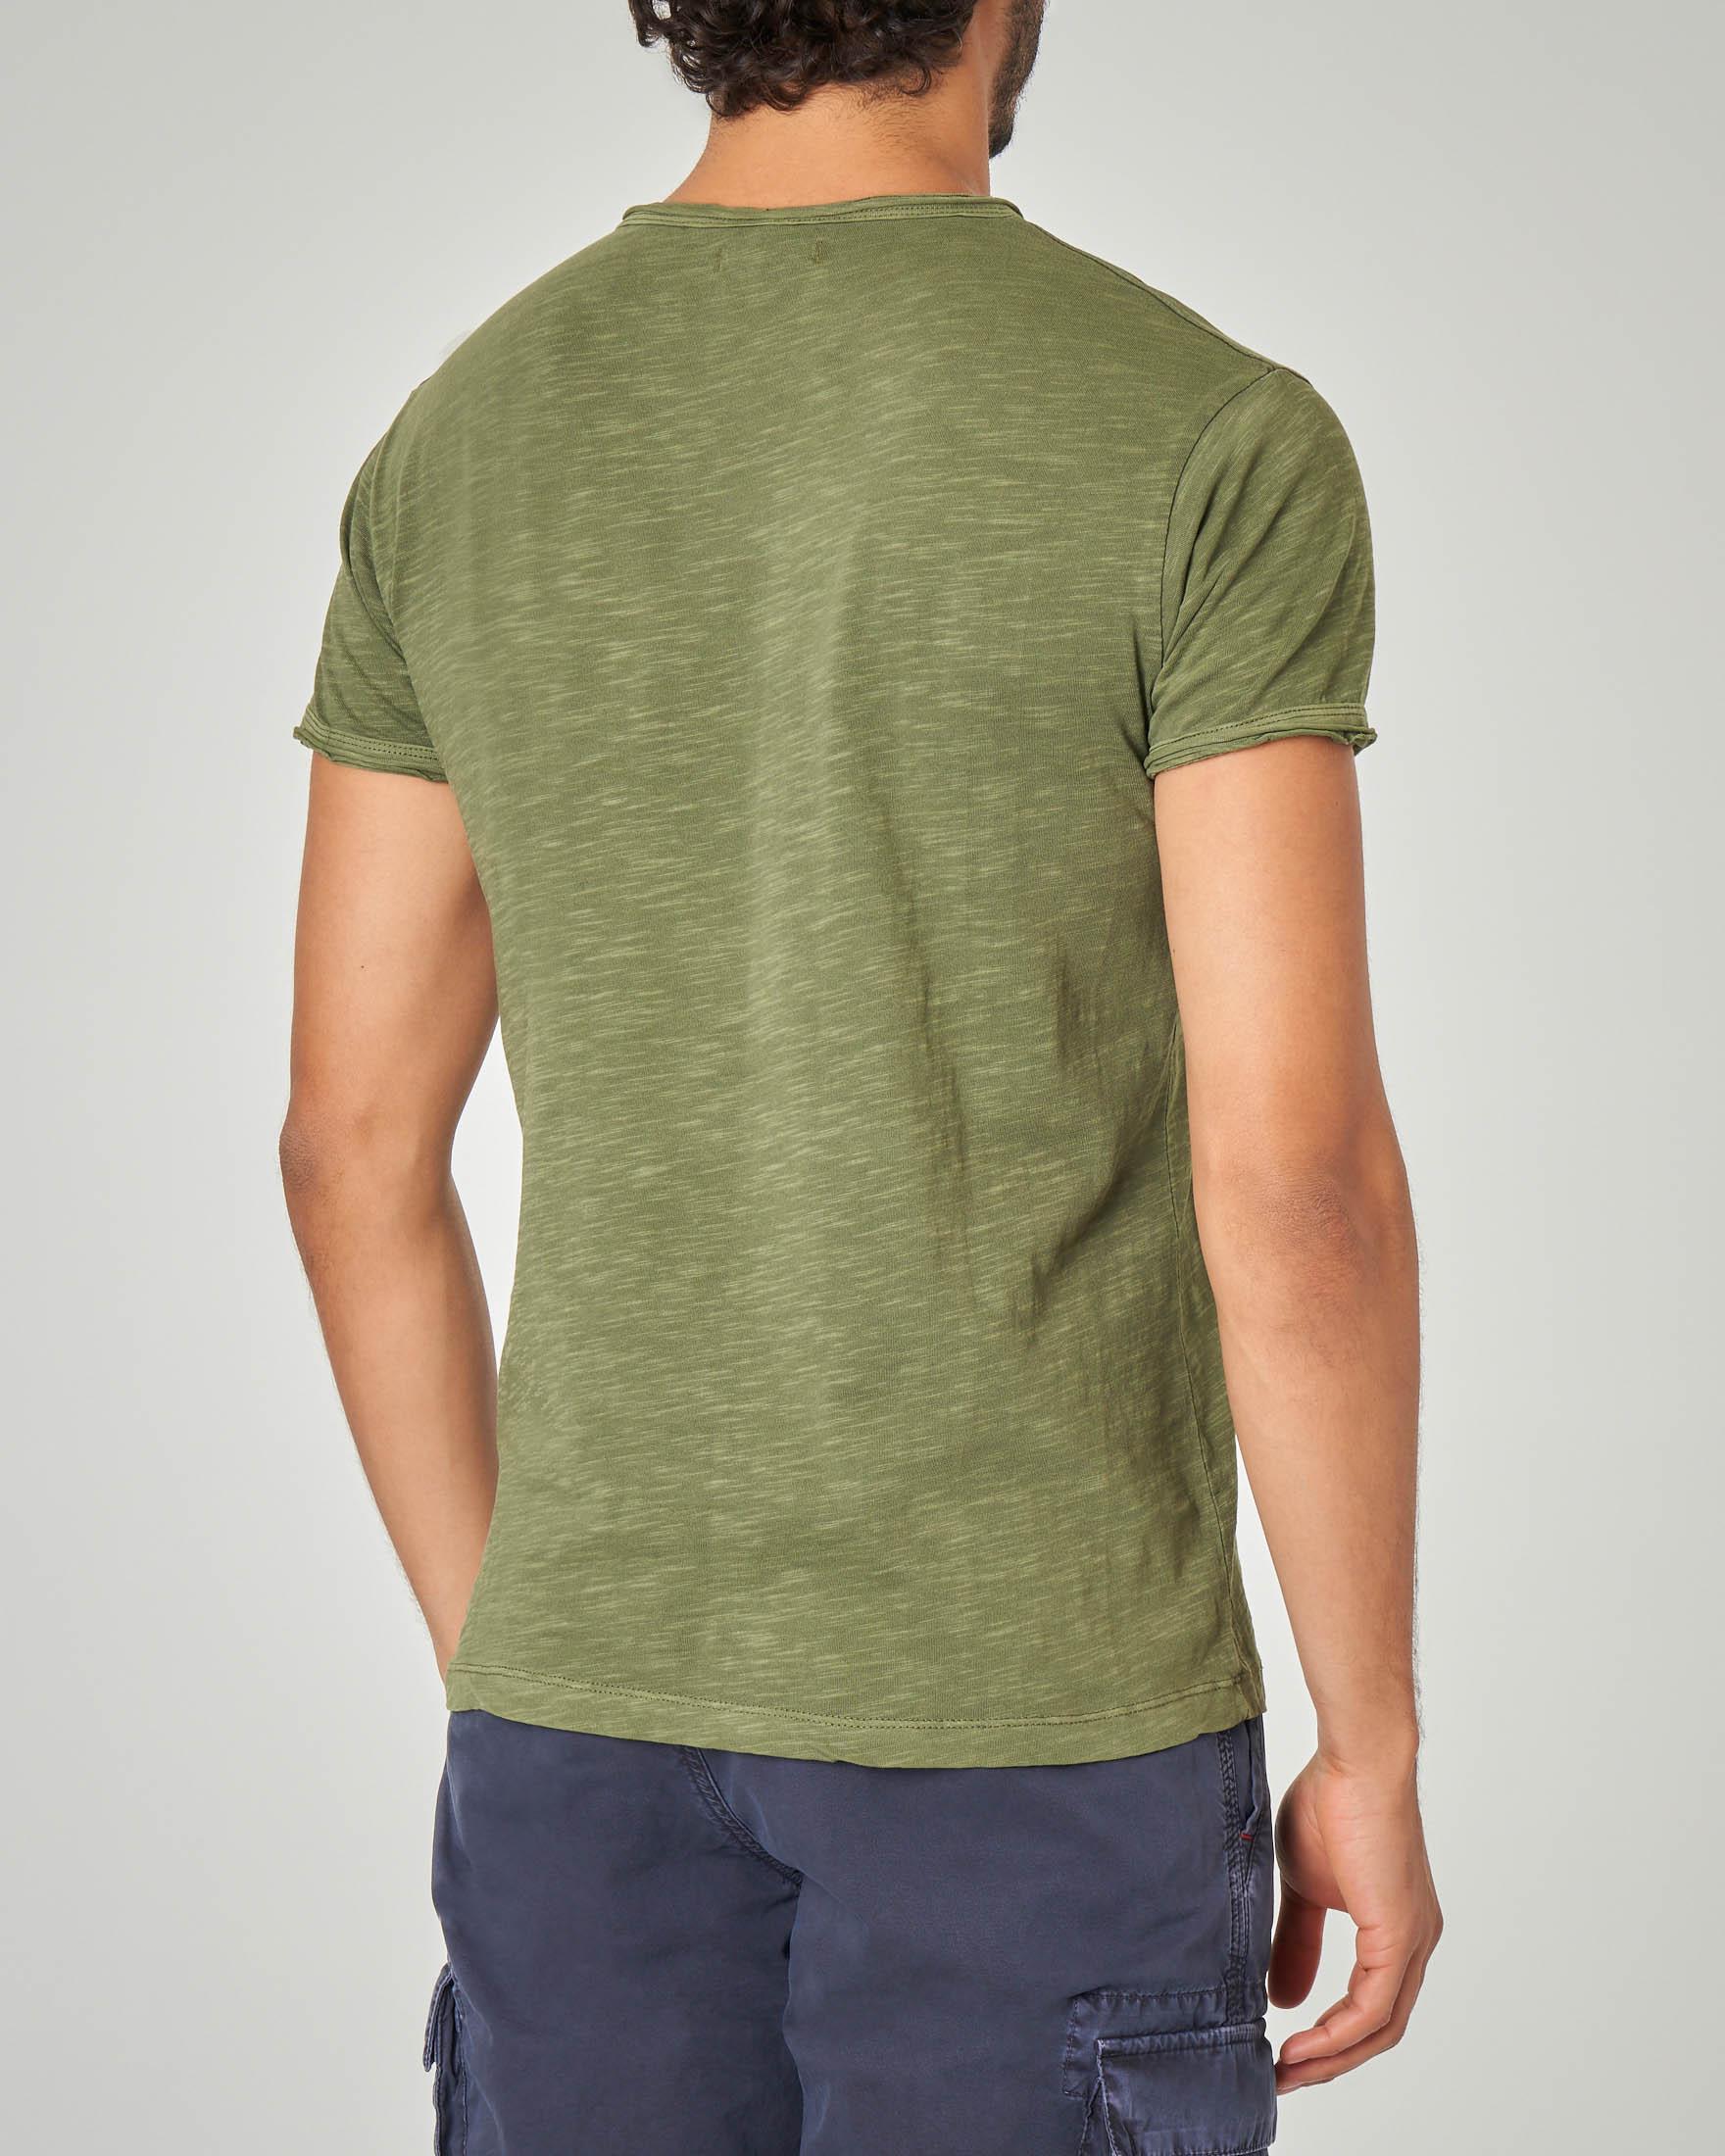 T-shirt serafino verde militare in tessuto slub